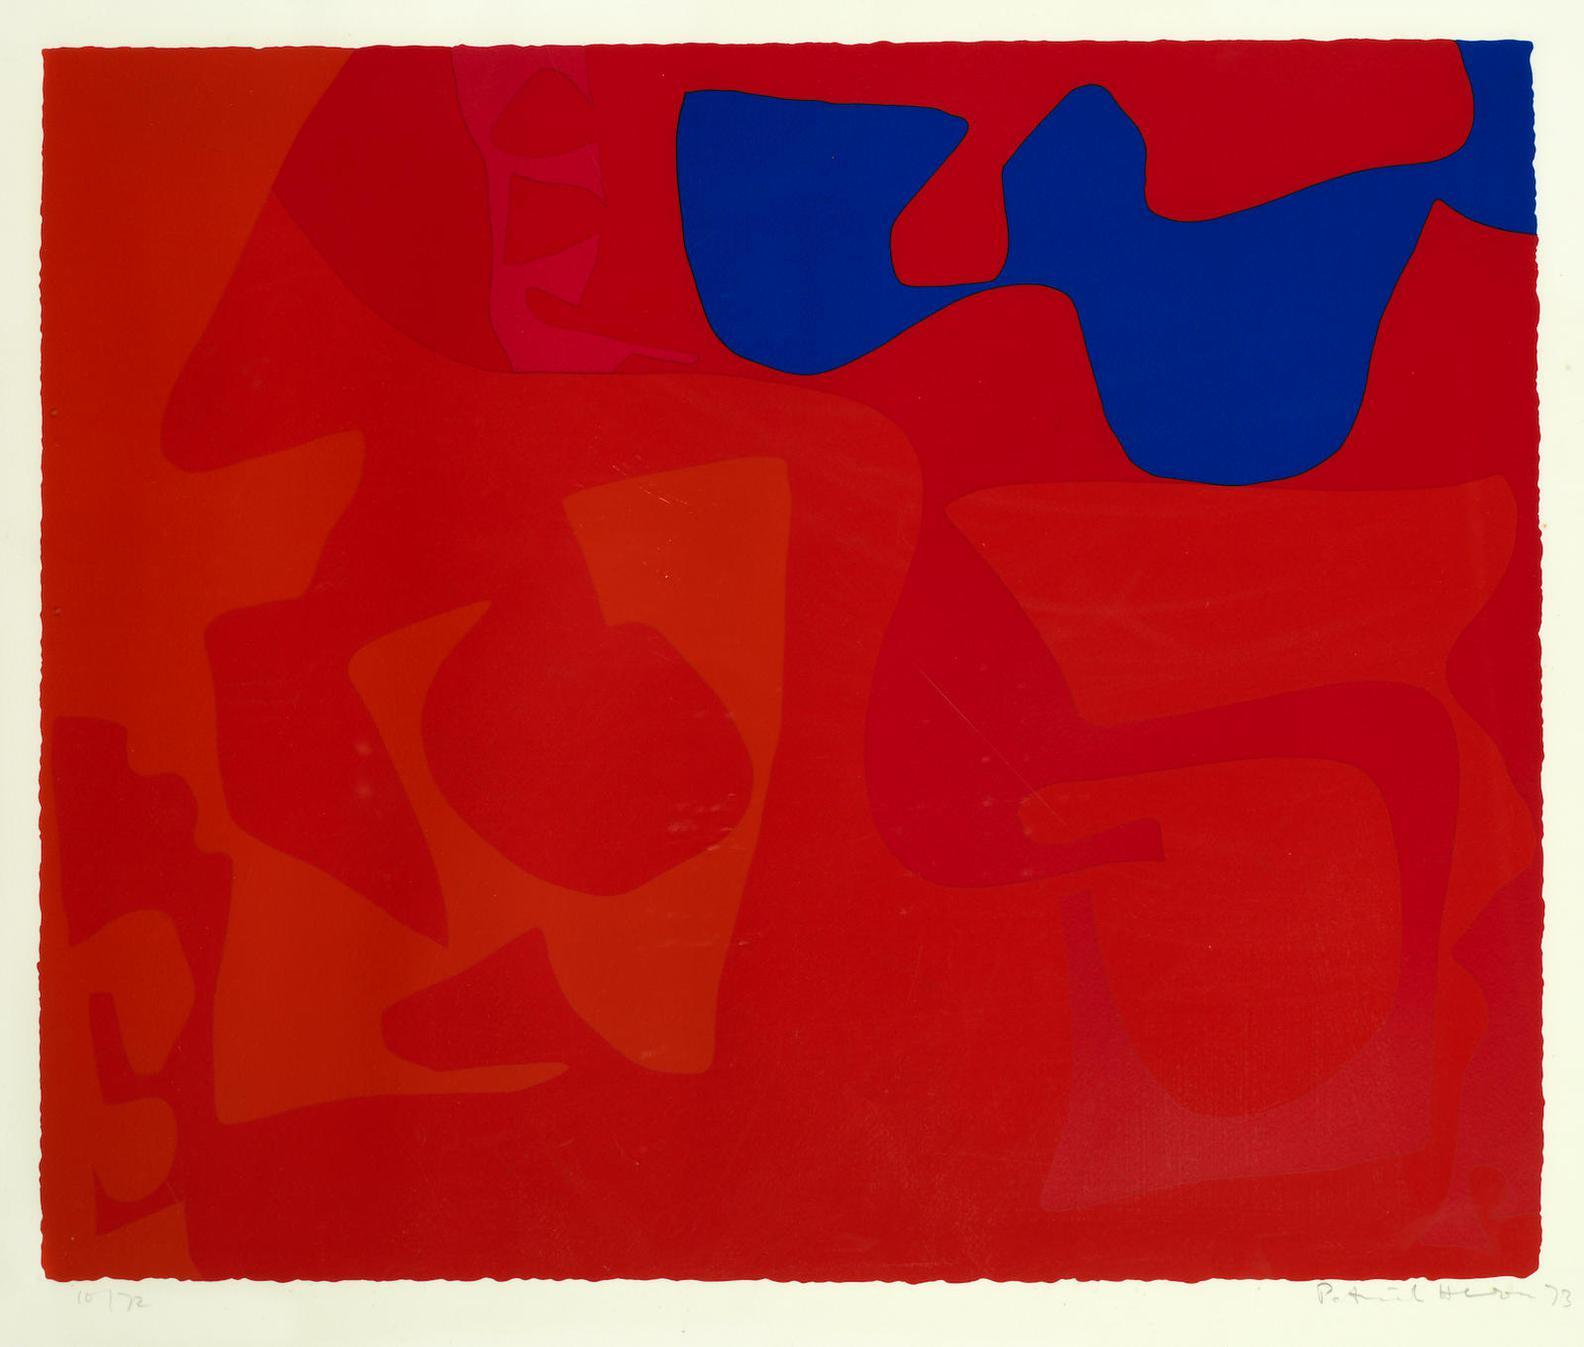 Patrick Heron-Small Red: January 1973 : 4-1973